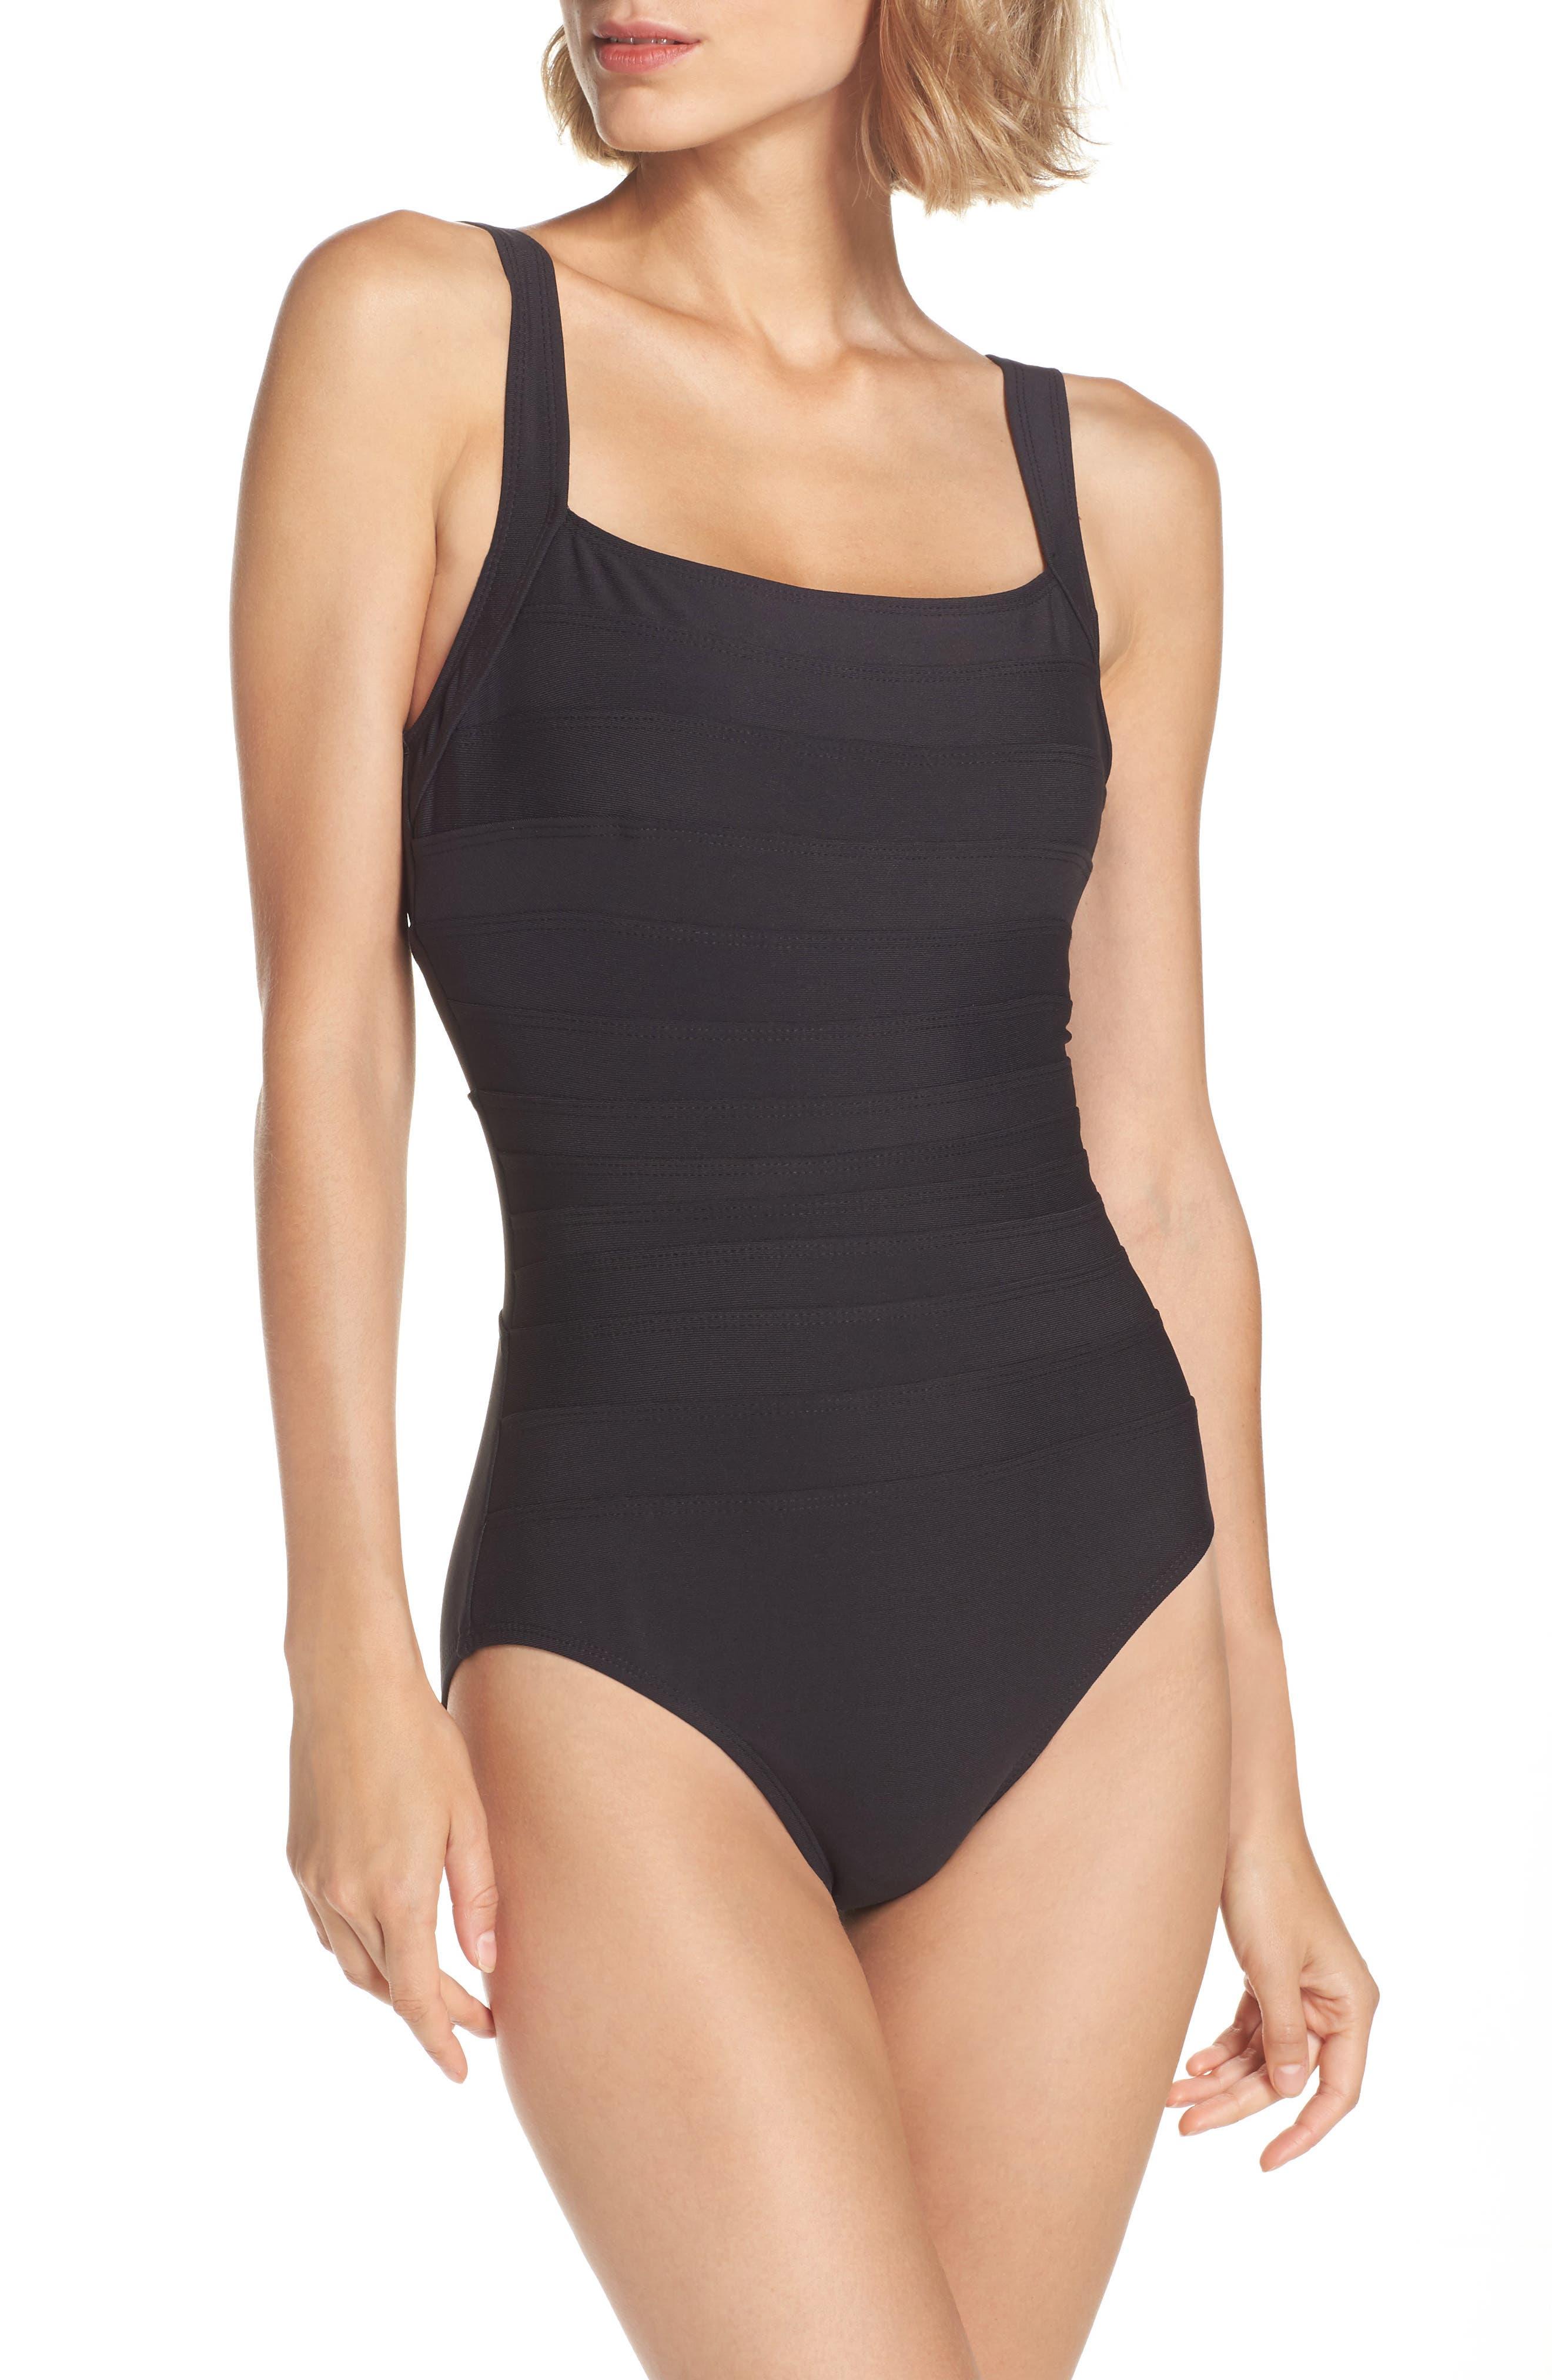 5624610afe9 Miraclesuit - Women's Swimwear and Beachwear